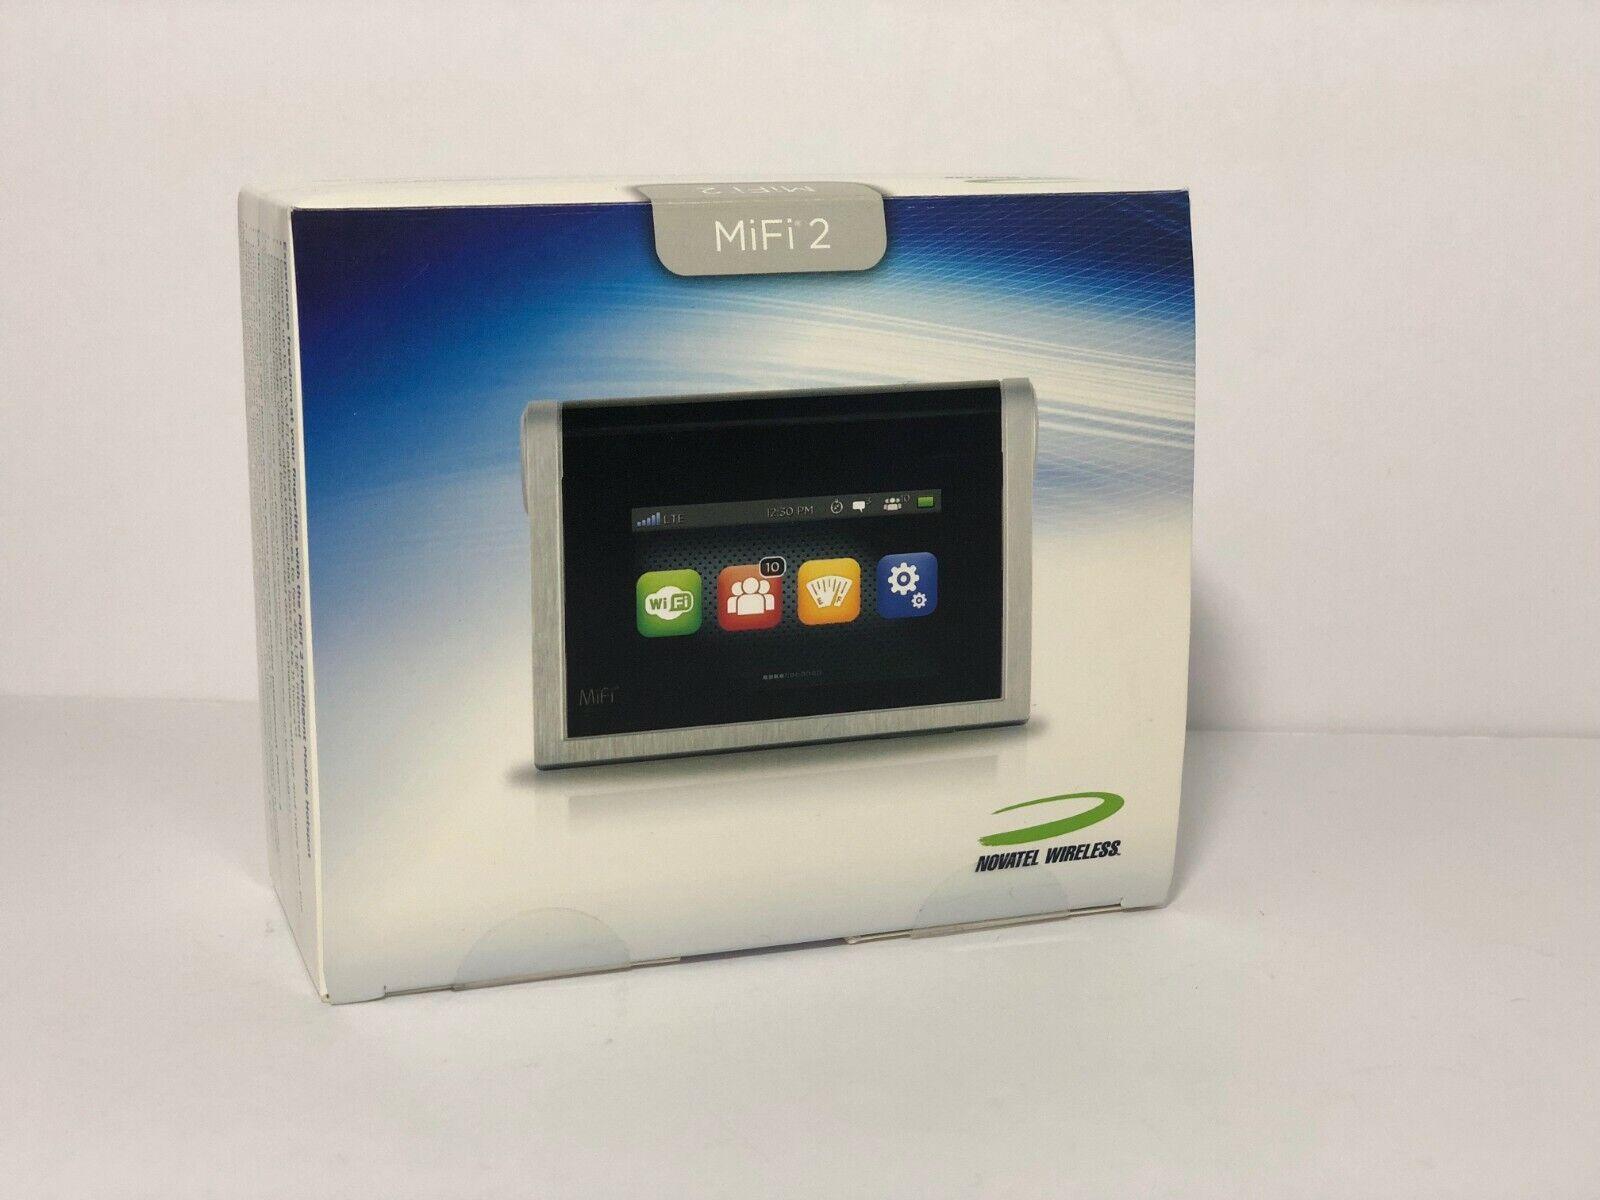 brand new mobile hotspot 4g lte gsm